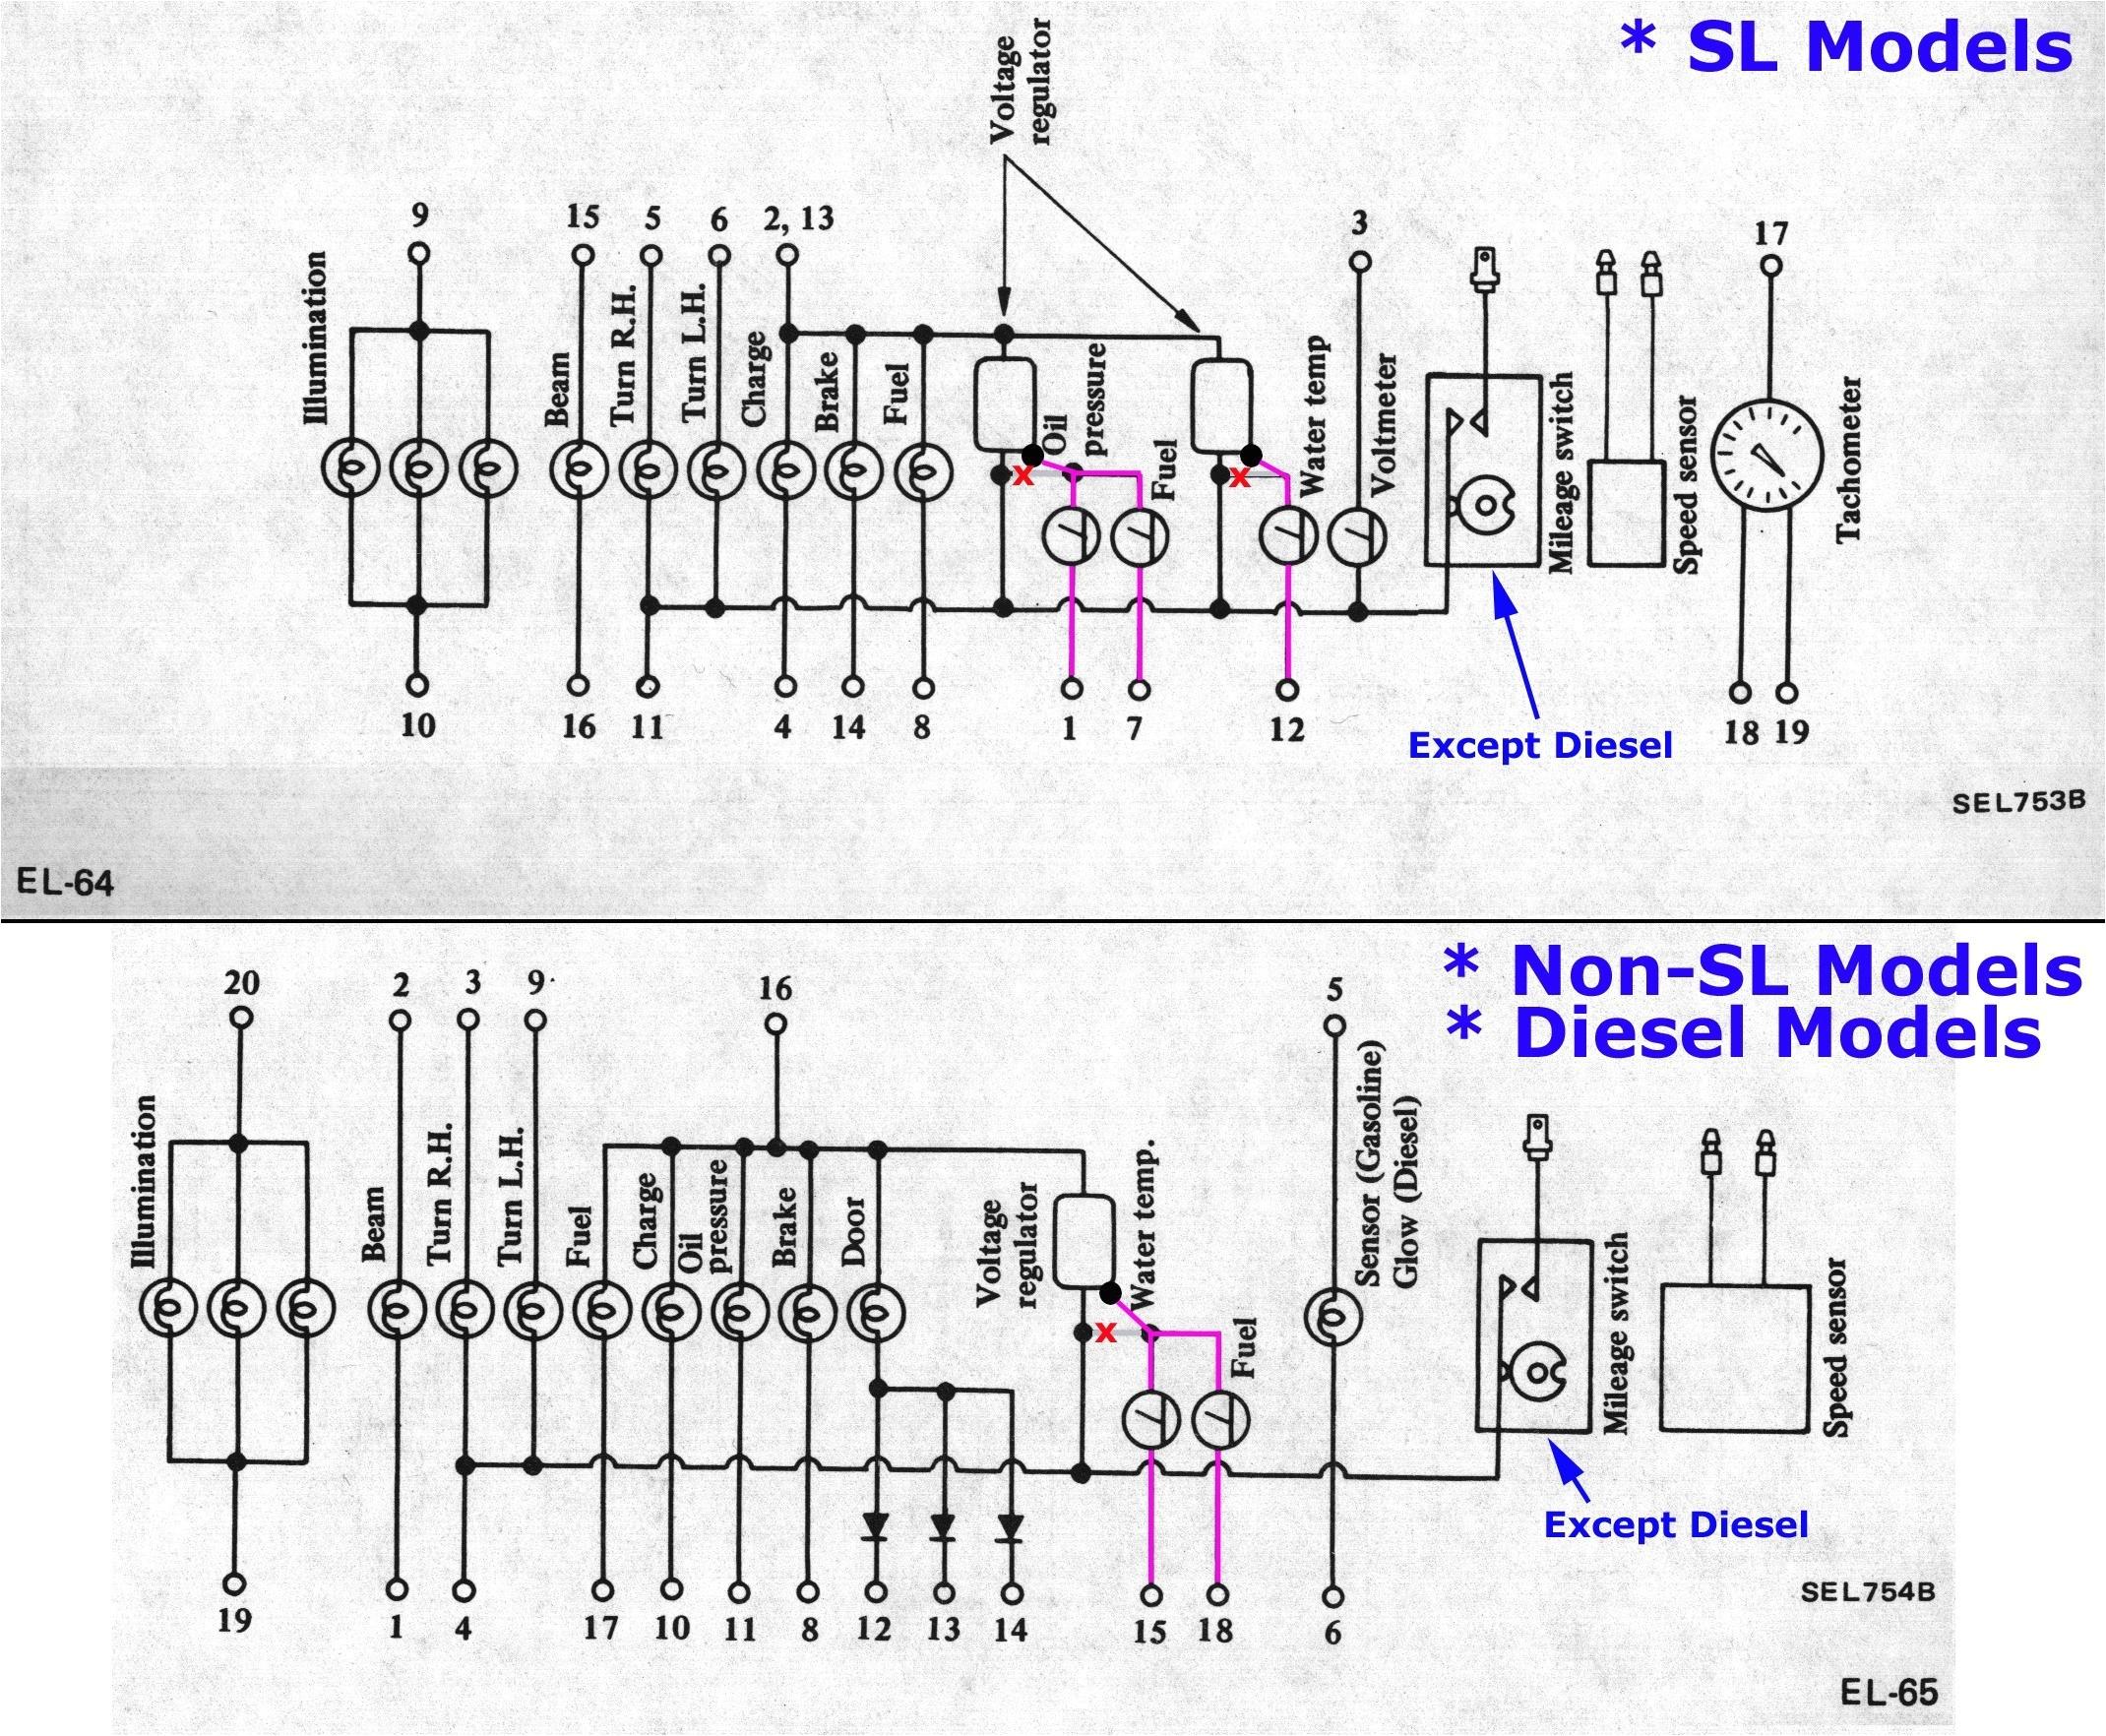 nissan pulsar n16 stereo wiring diagram valid 2006 sentra fuse best index maxima fsm of radio jpg